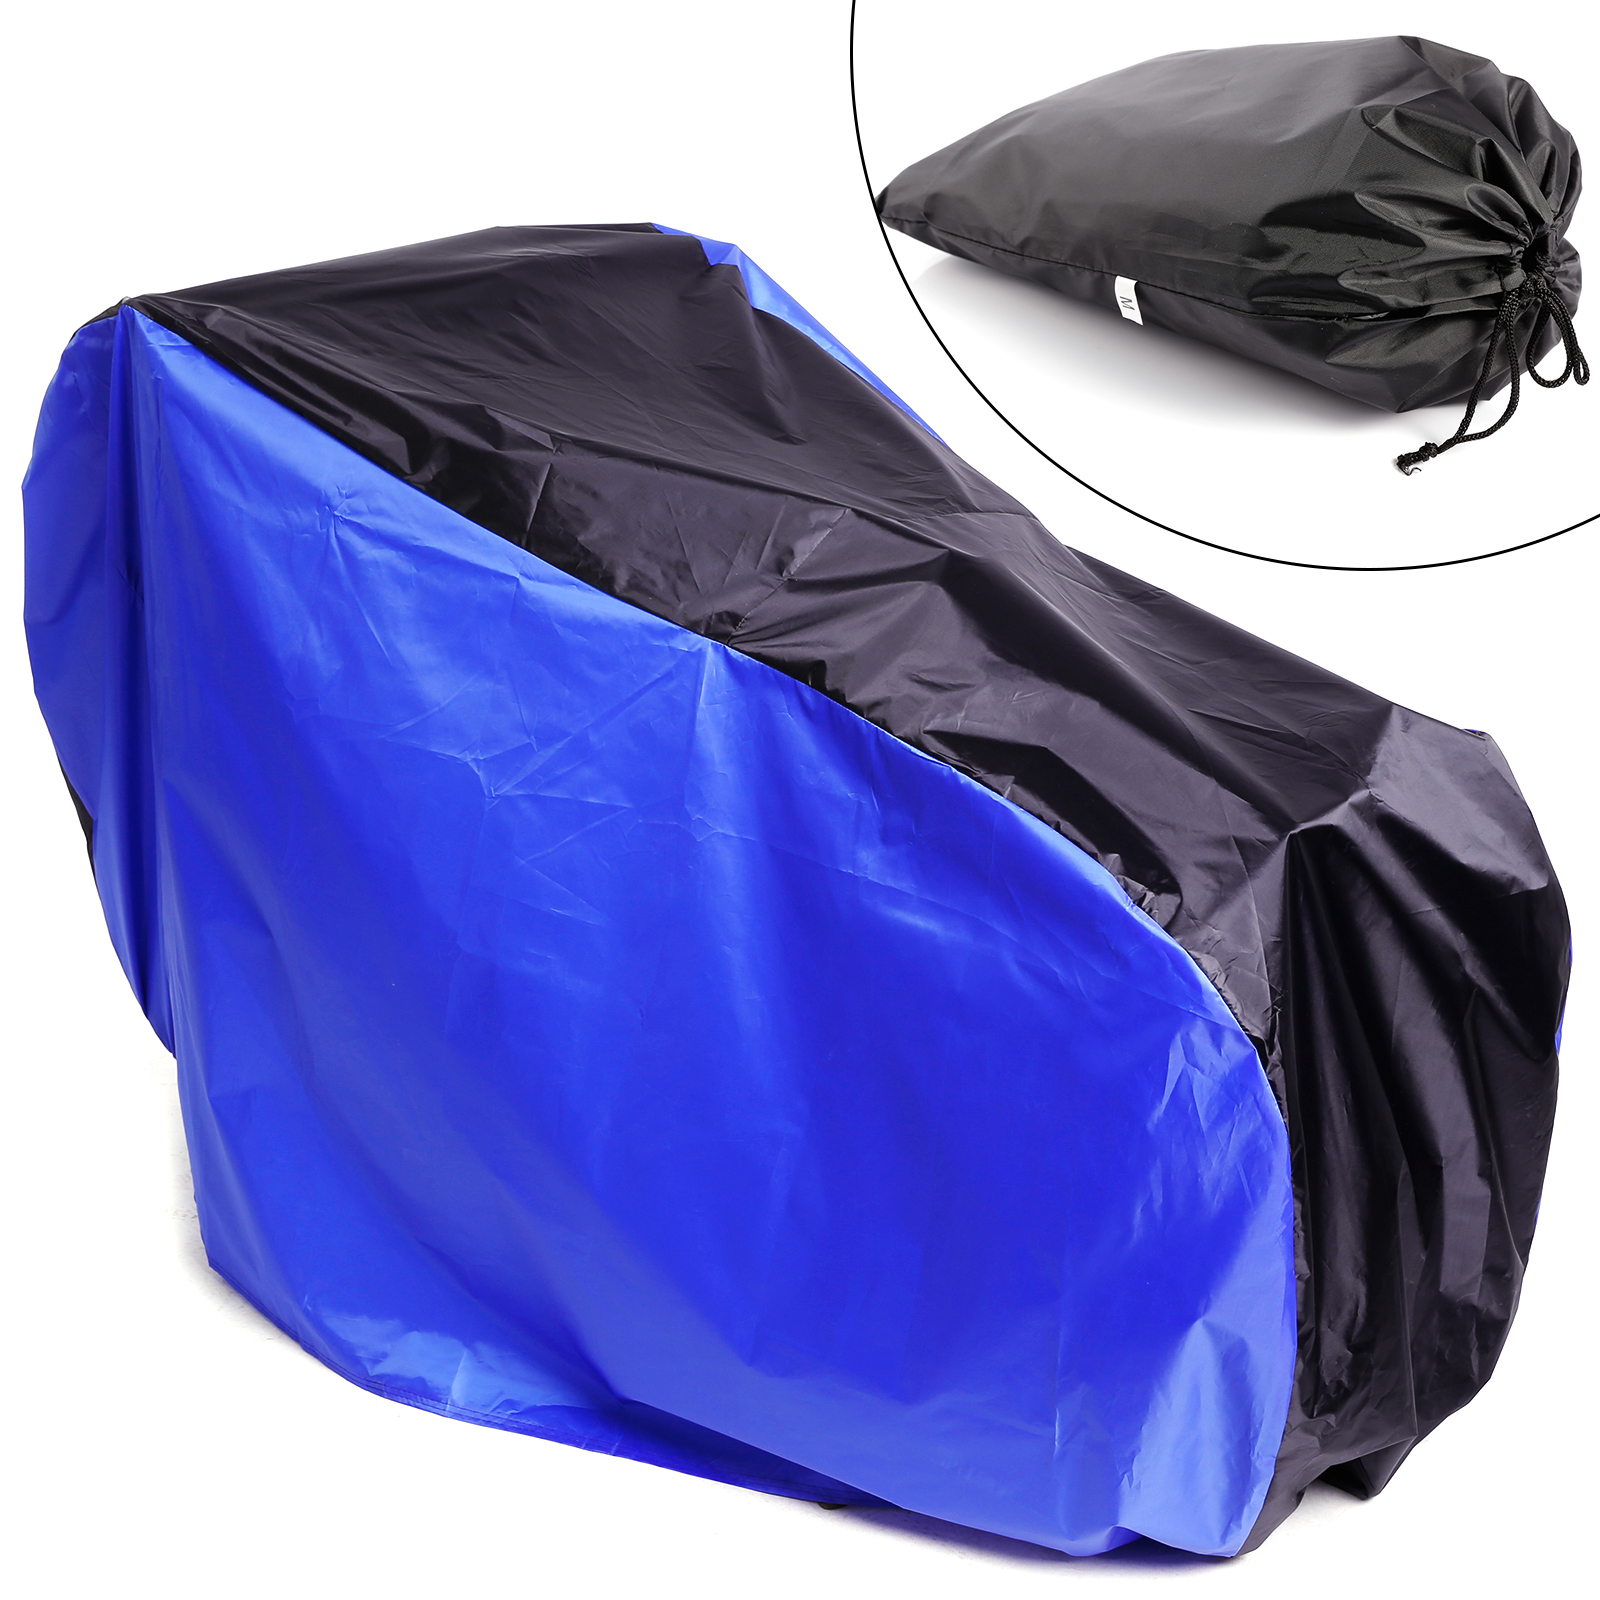 fahrradschutzh lle fahrradgarage cover abdeckplane. Black Bedroom Furniture Sets. Home Design Ideas